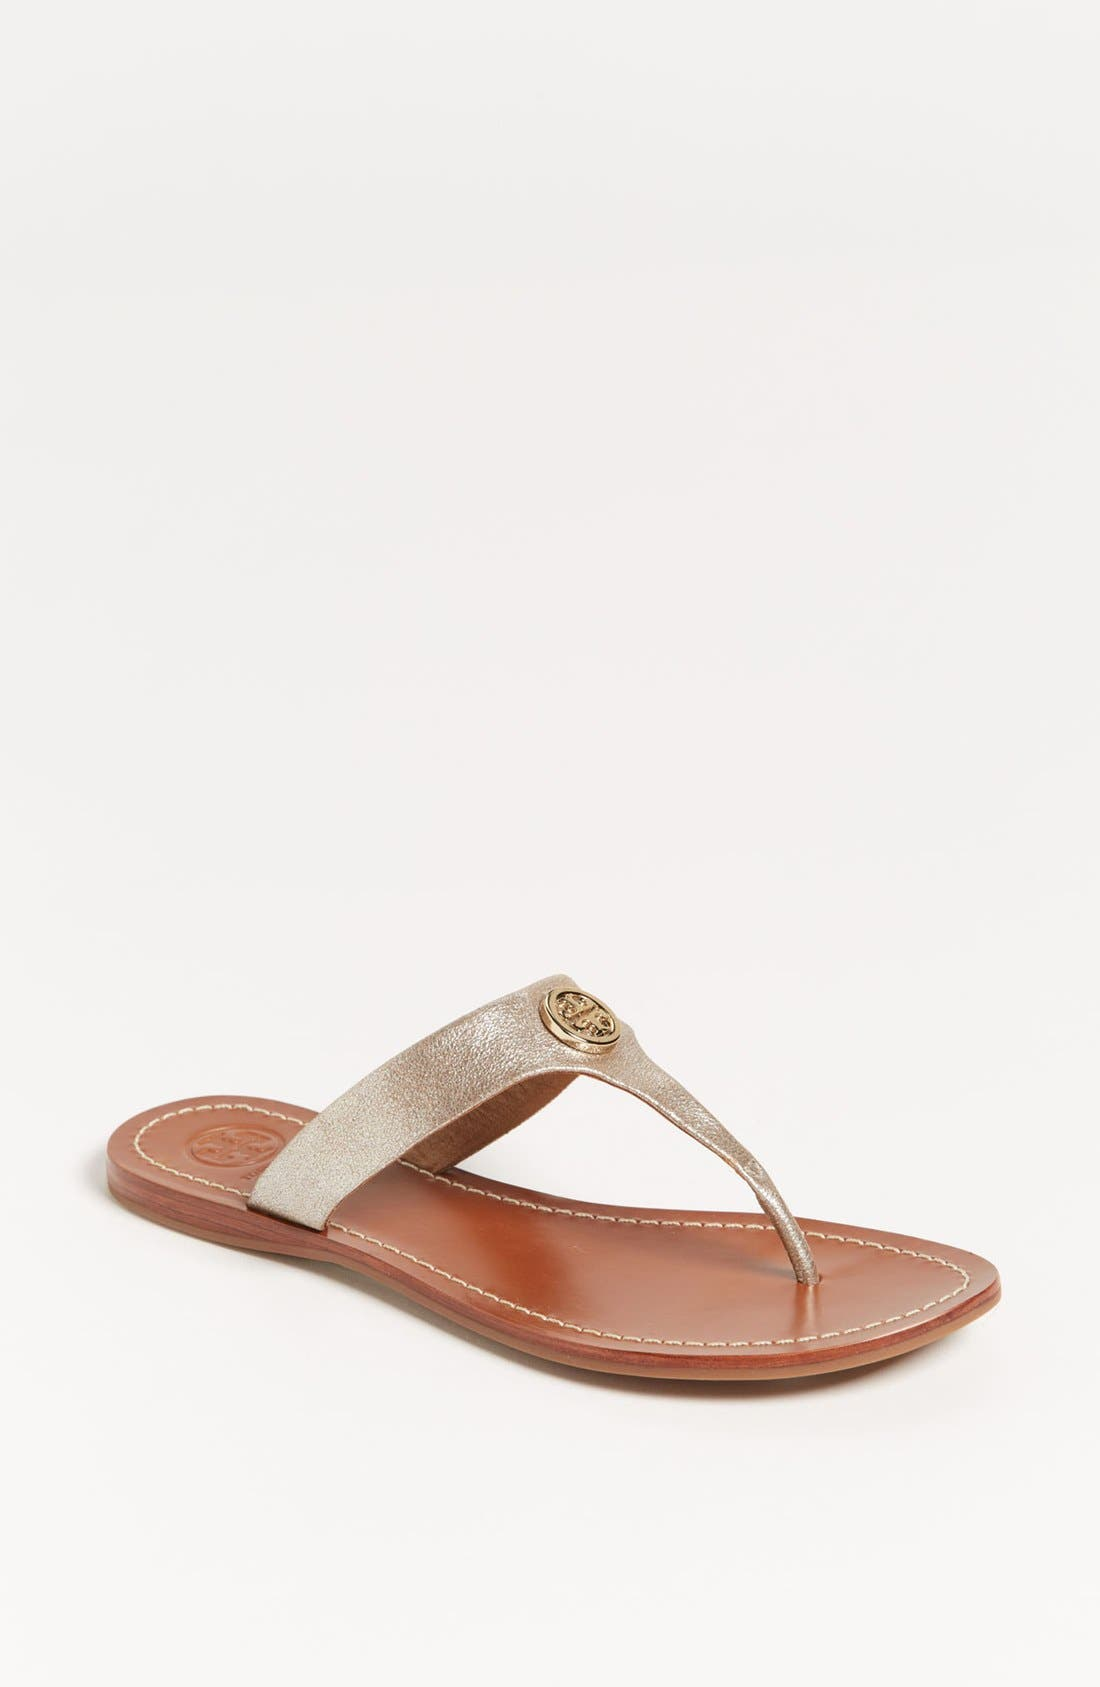 Main Image - Tory Burch 'Cameron' Sandal (Exclusive Color)